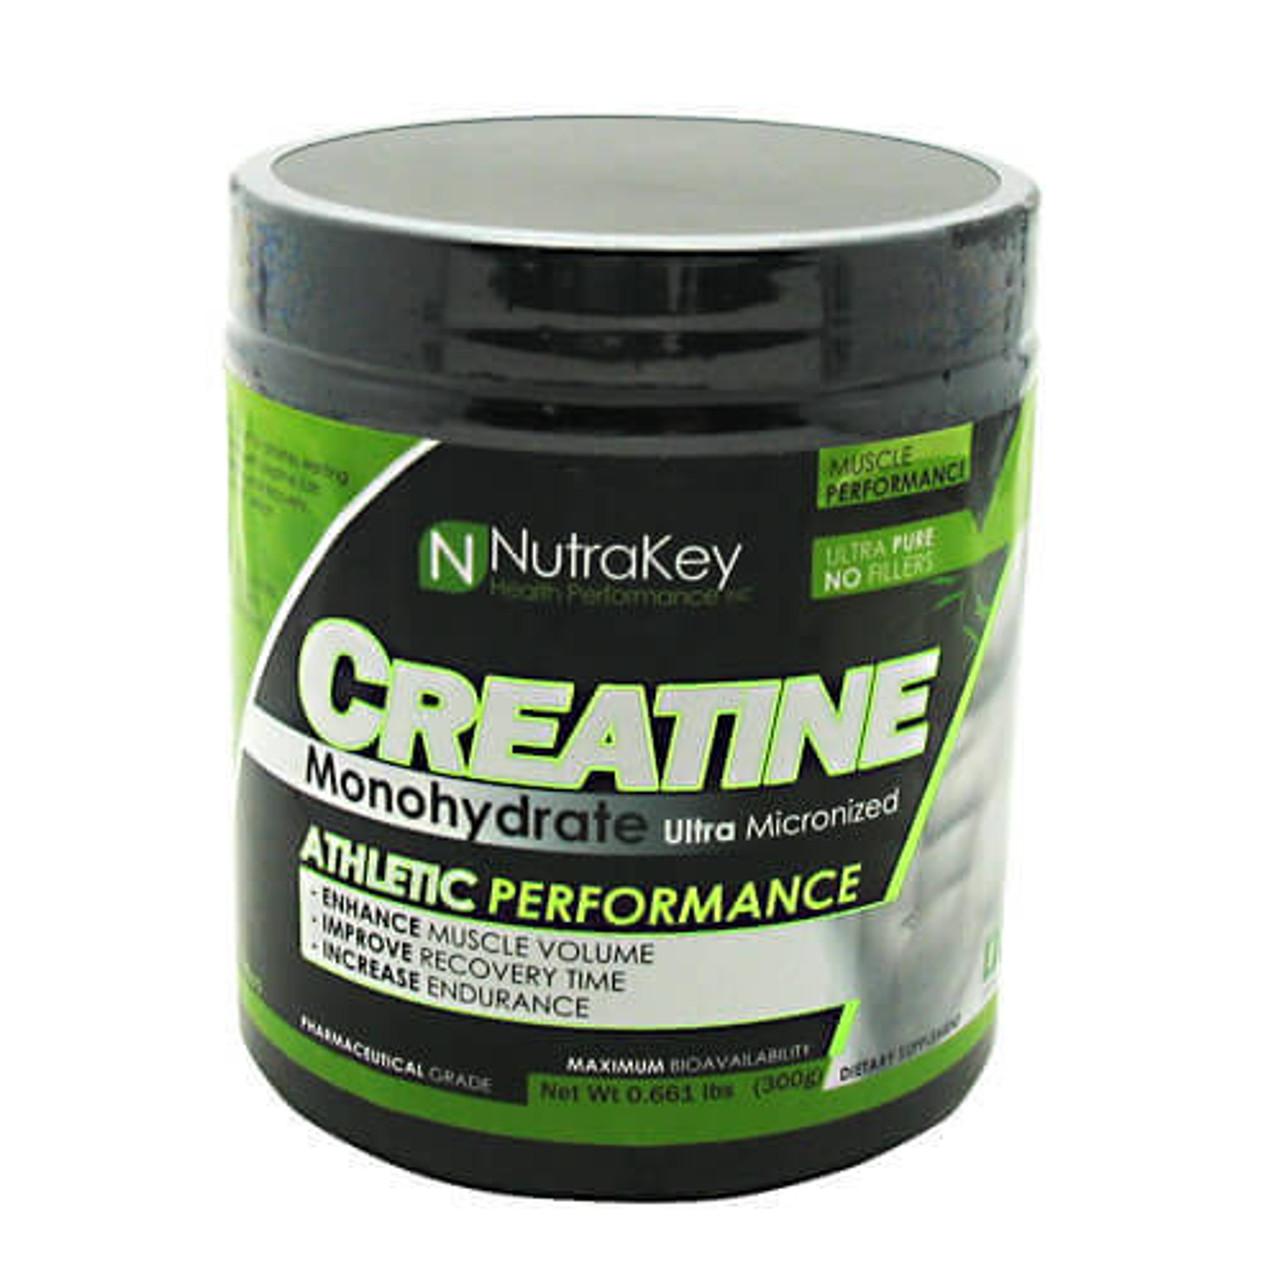 Creatine Monohydrate by NutraKey 300g